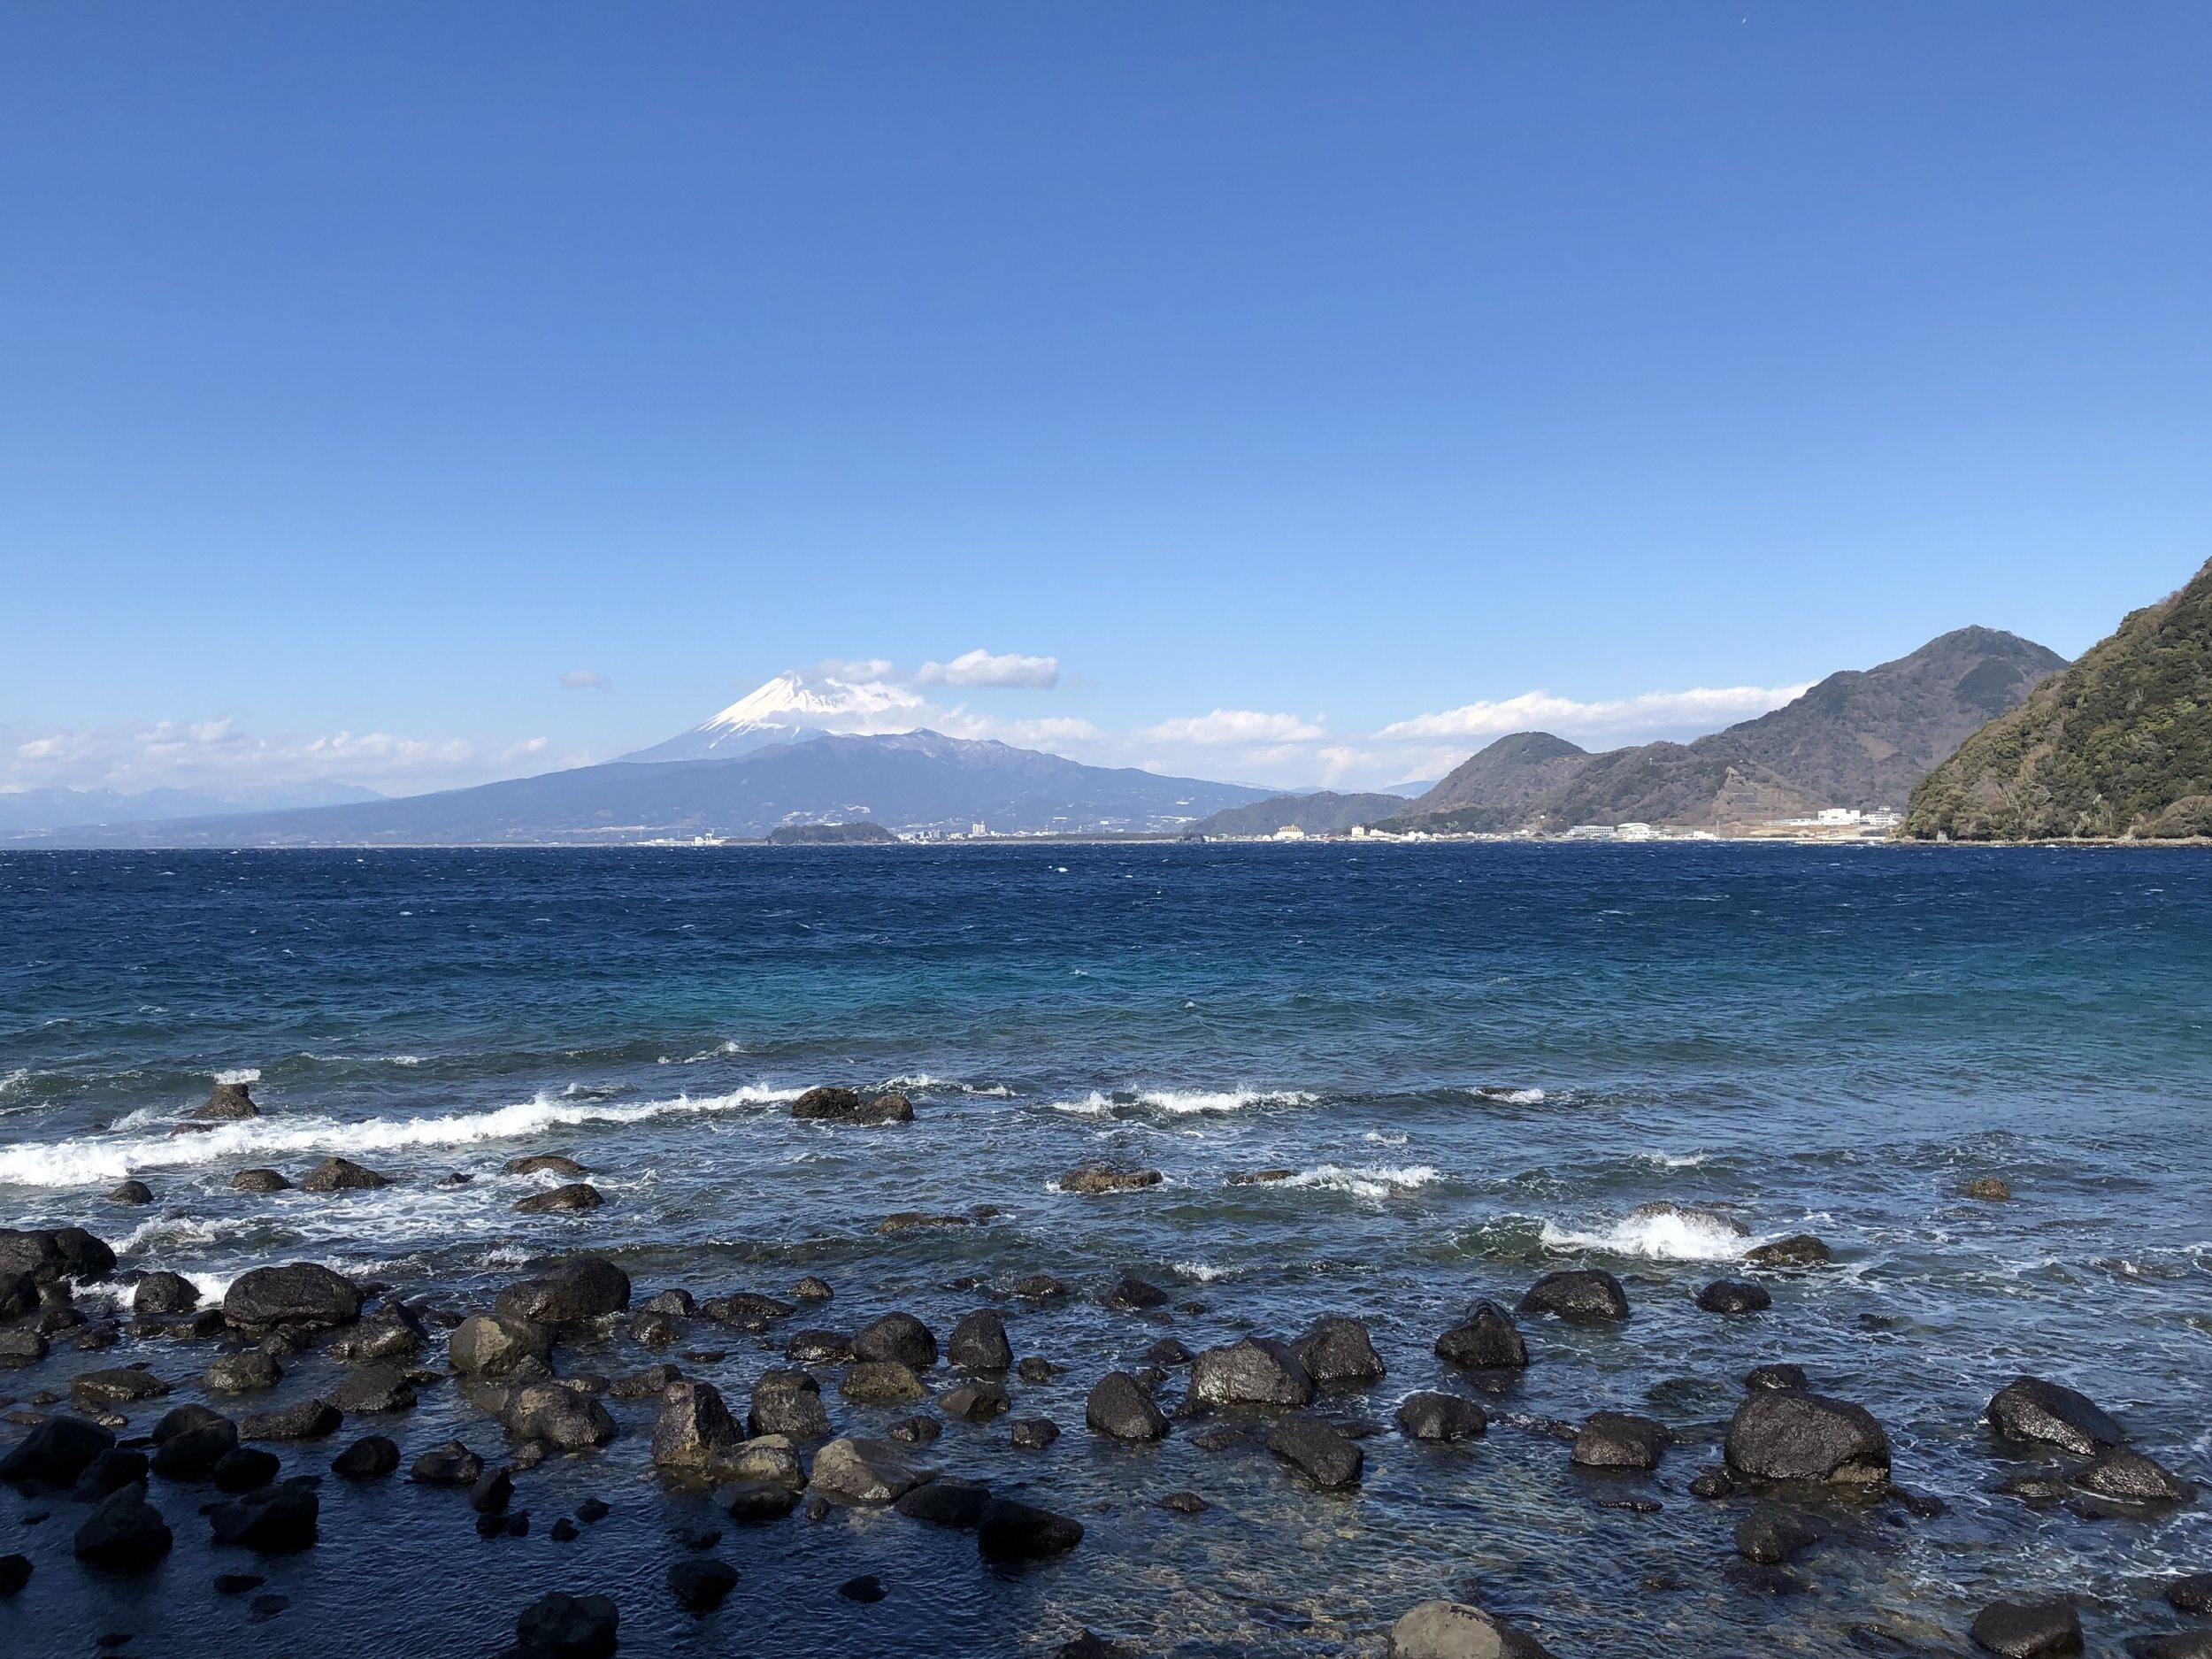 The Tiny Wave off Kanagawa